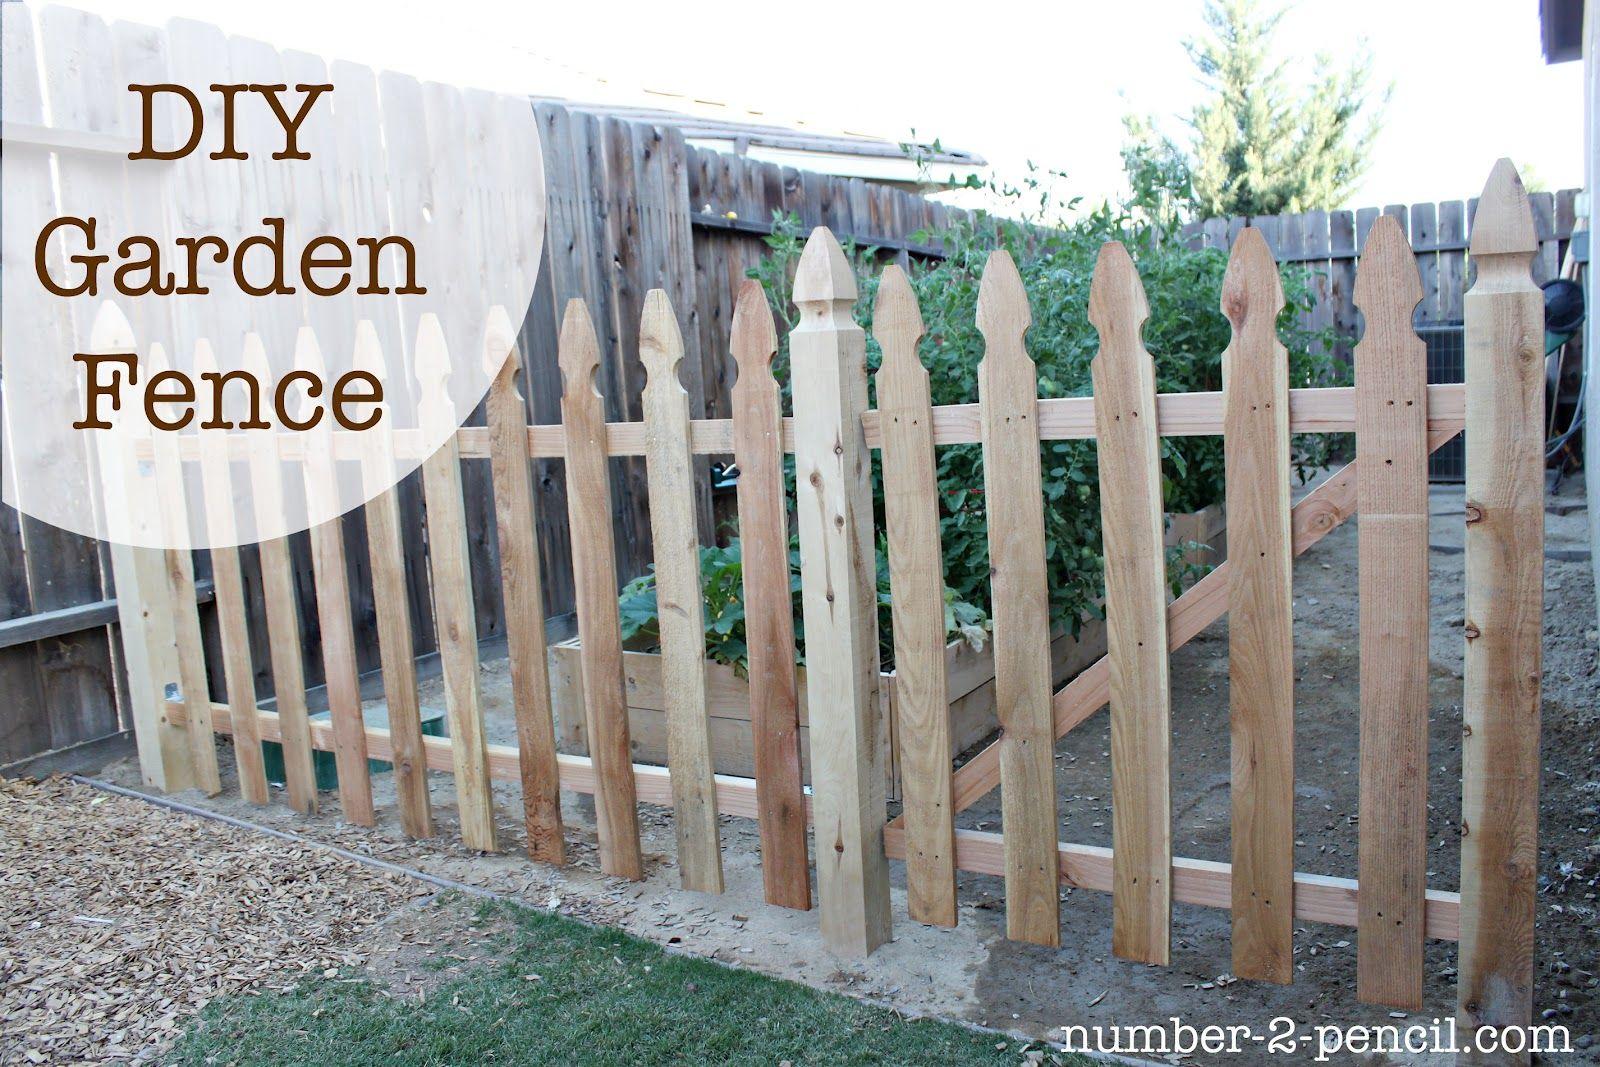 Build An Easy Diy Garden Fence With Images Diy Garden Fence